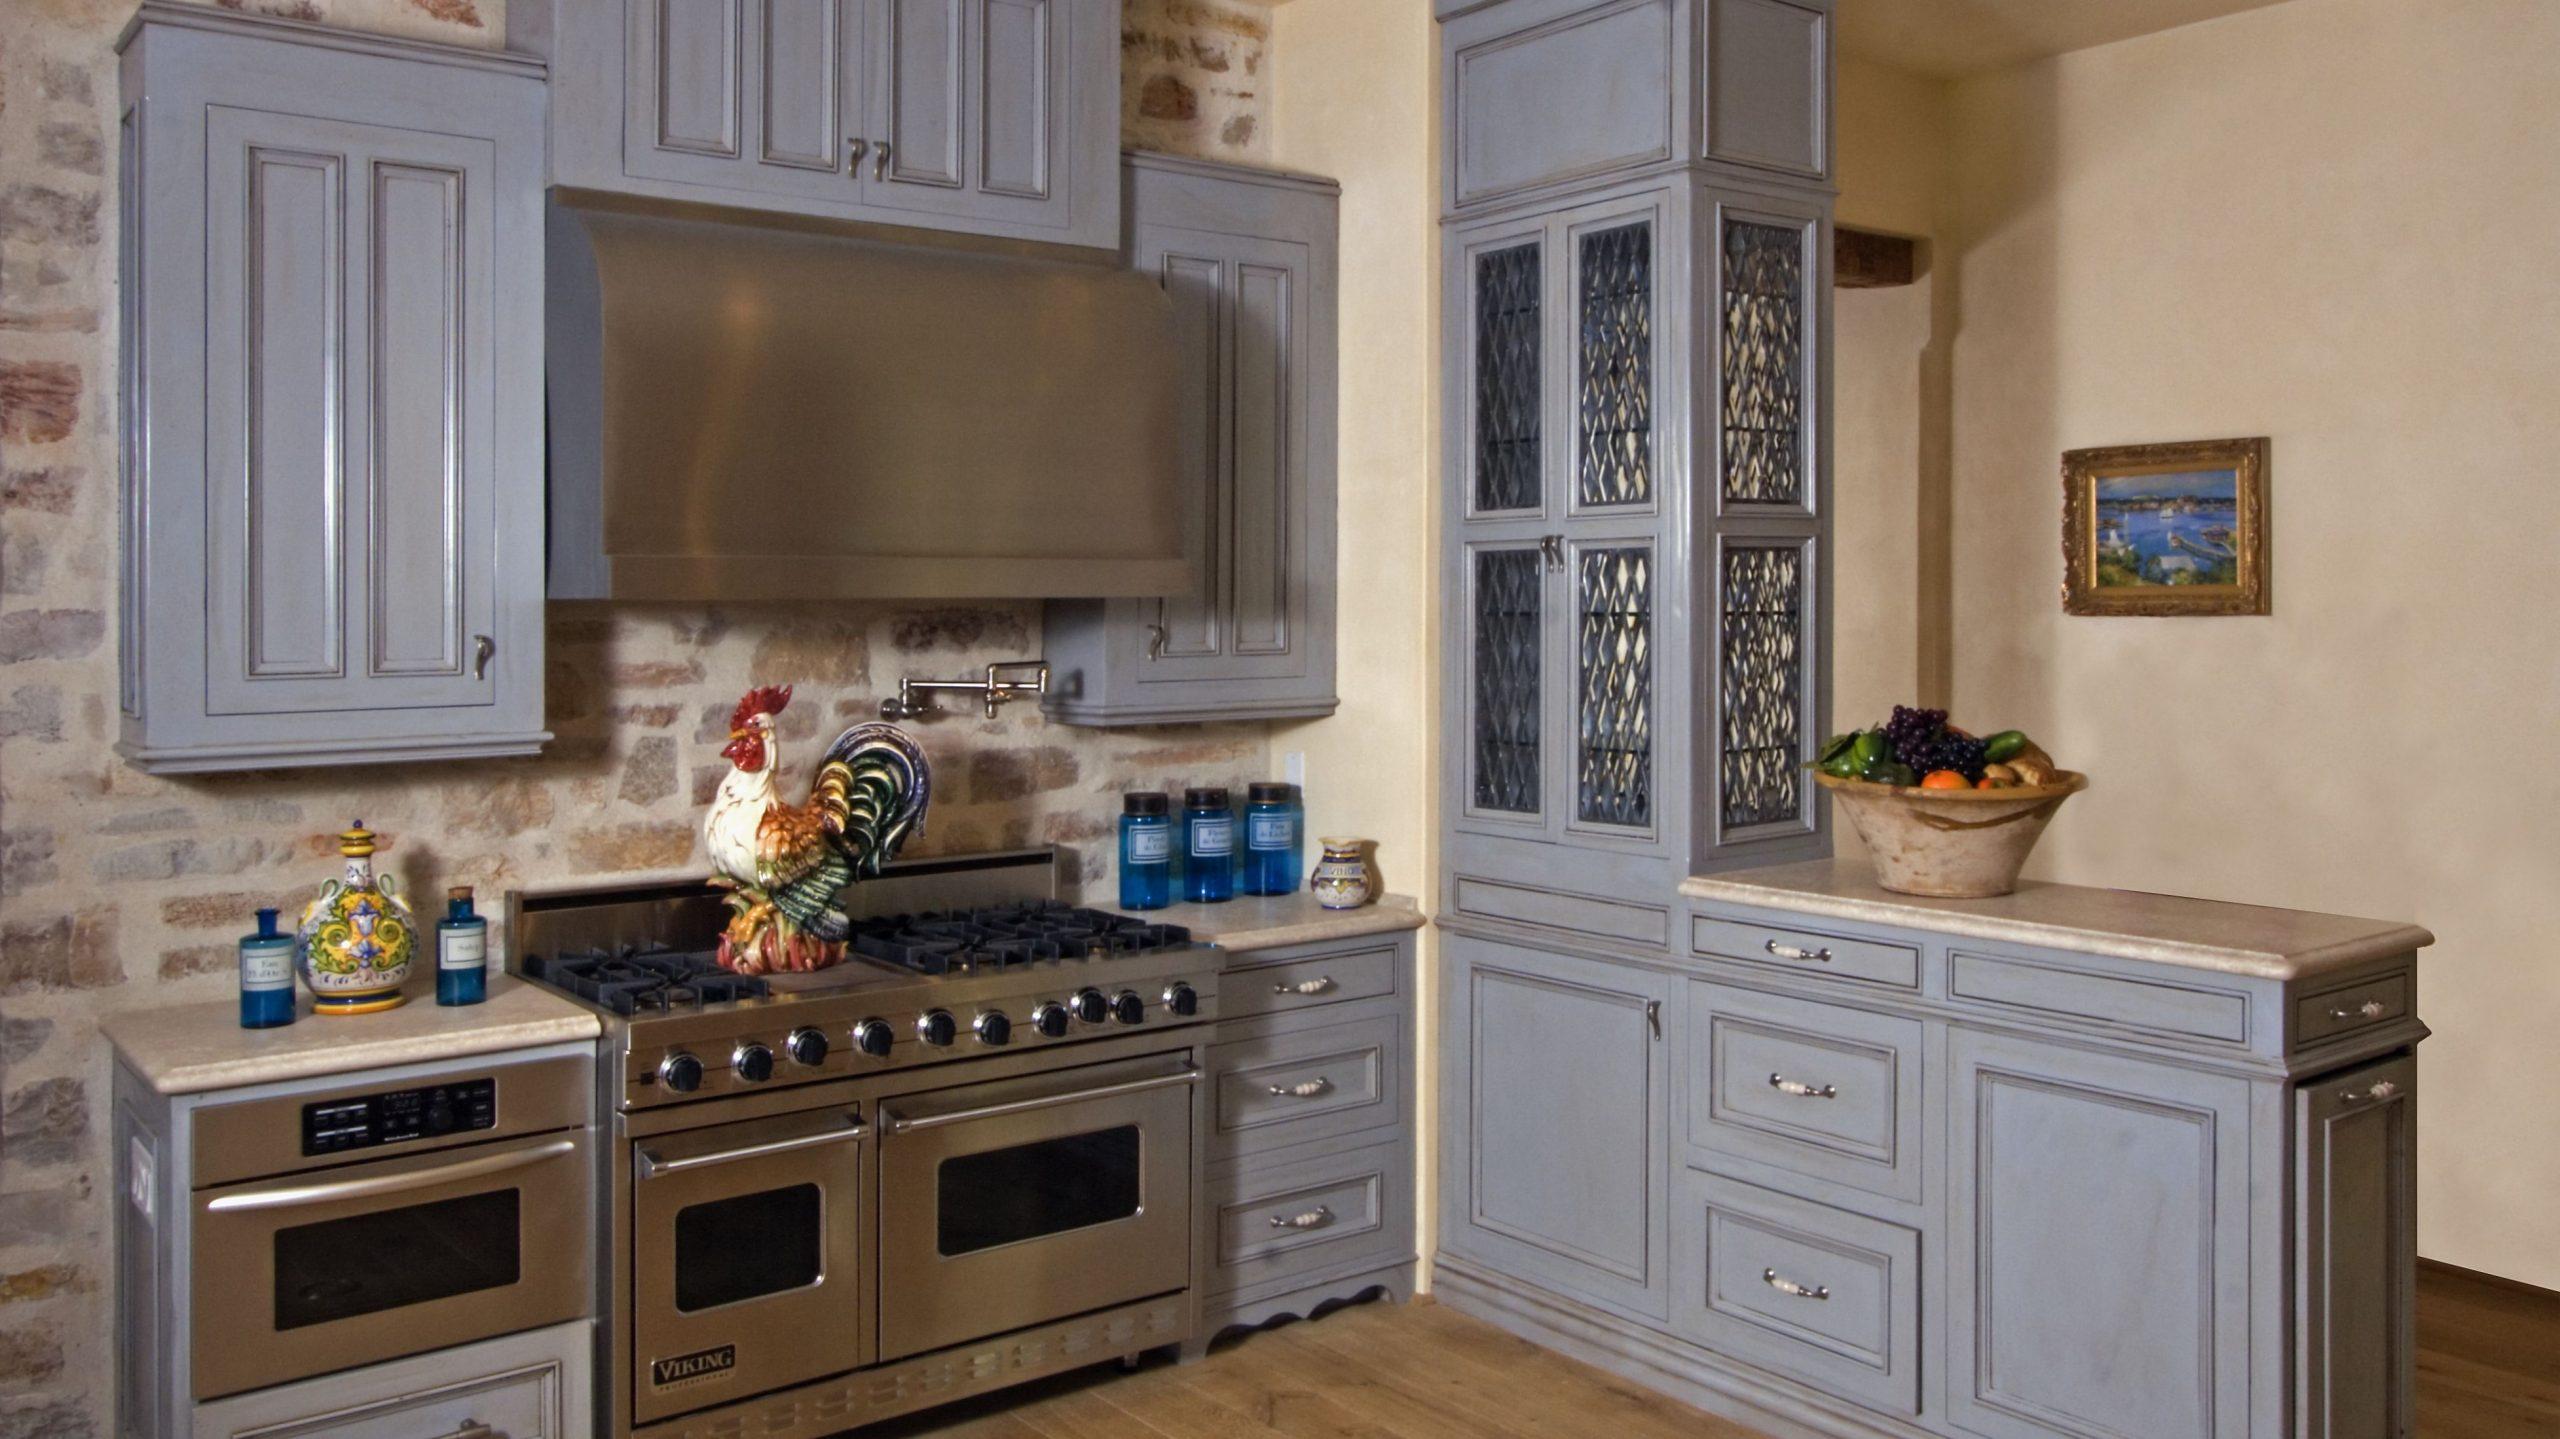 Beautiful Blue Kitchen Design Ideas - Gray Kitchen Cabinets With Blue Backsplash